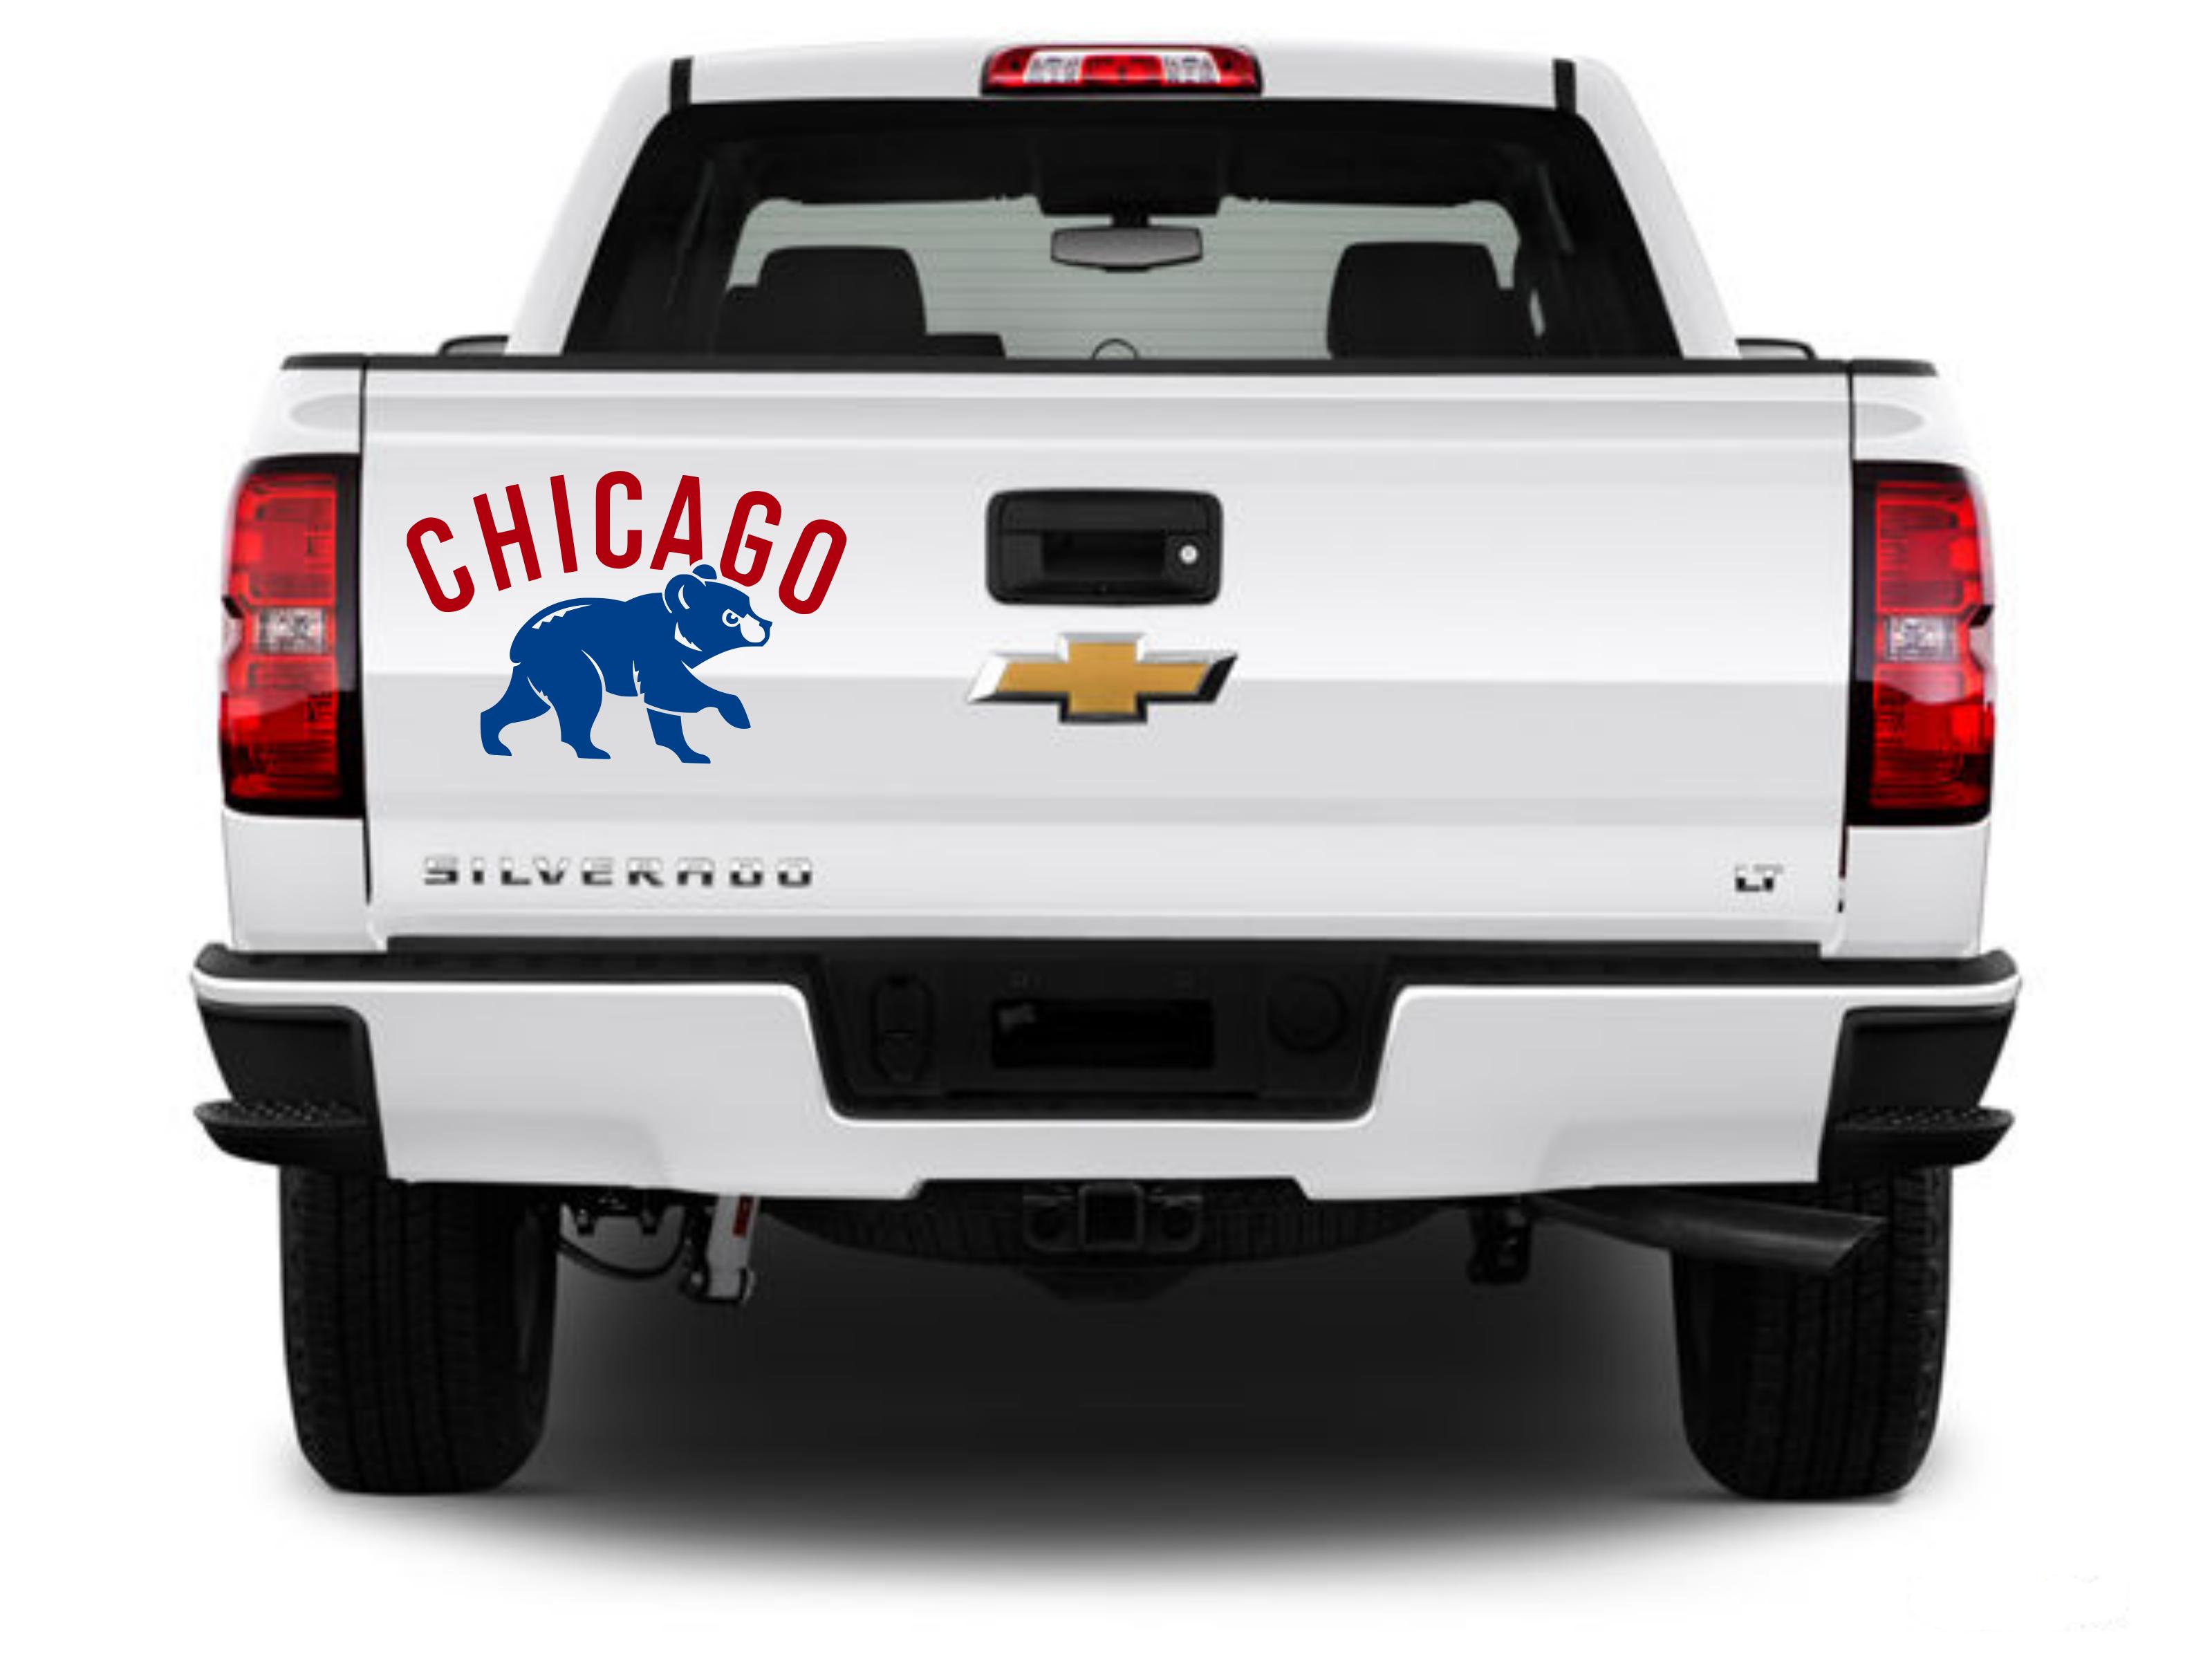 Chicago Cubs Logo Vinyl Decal Vinyl For Cars Vinyl Decals Chicago Cubs [ 2399 x 3199 Pixel ]